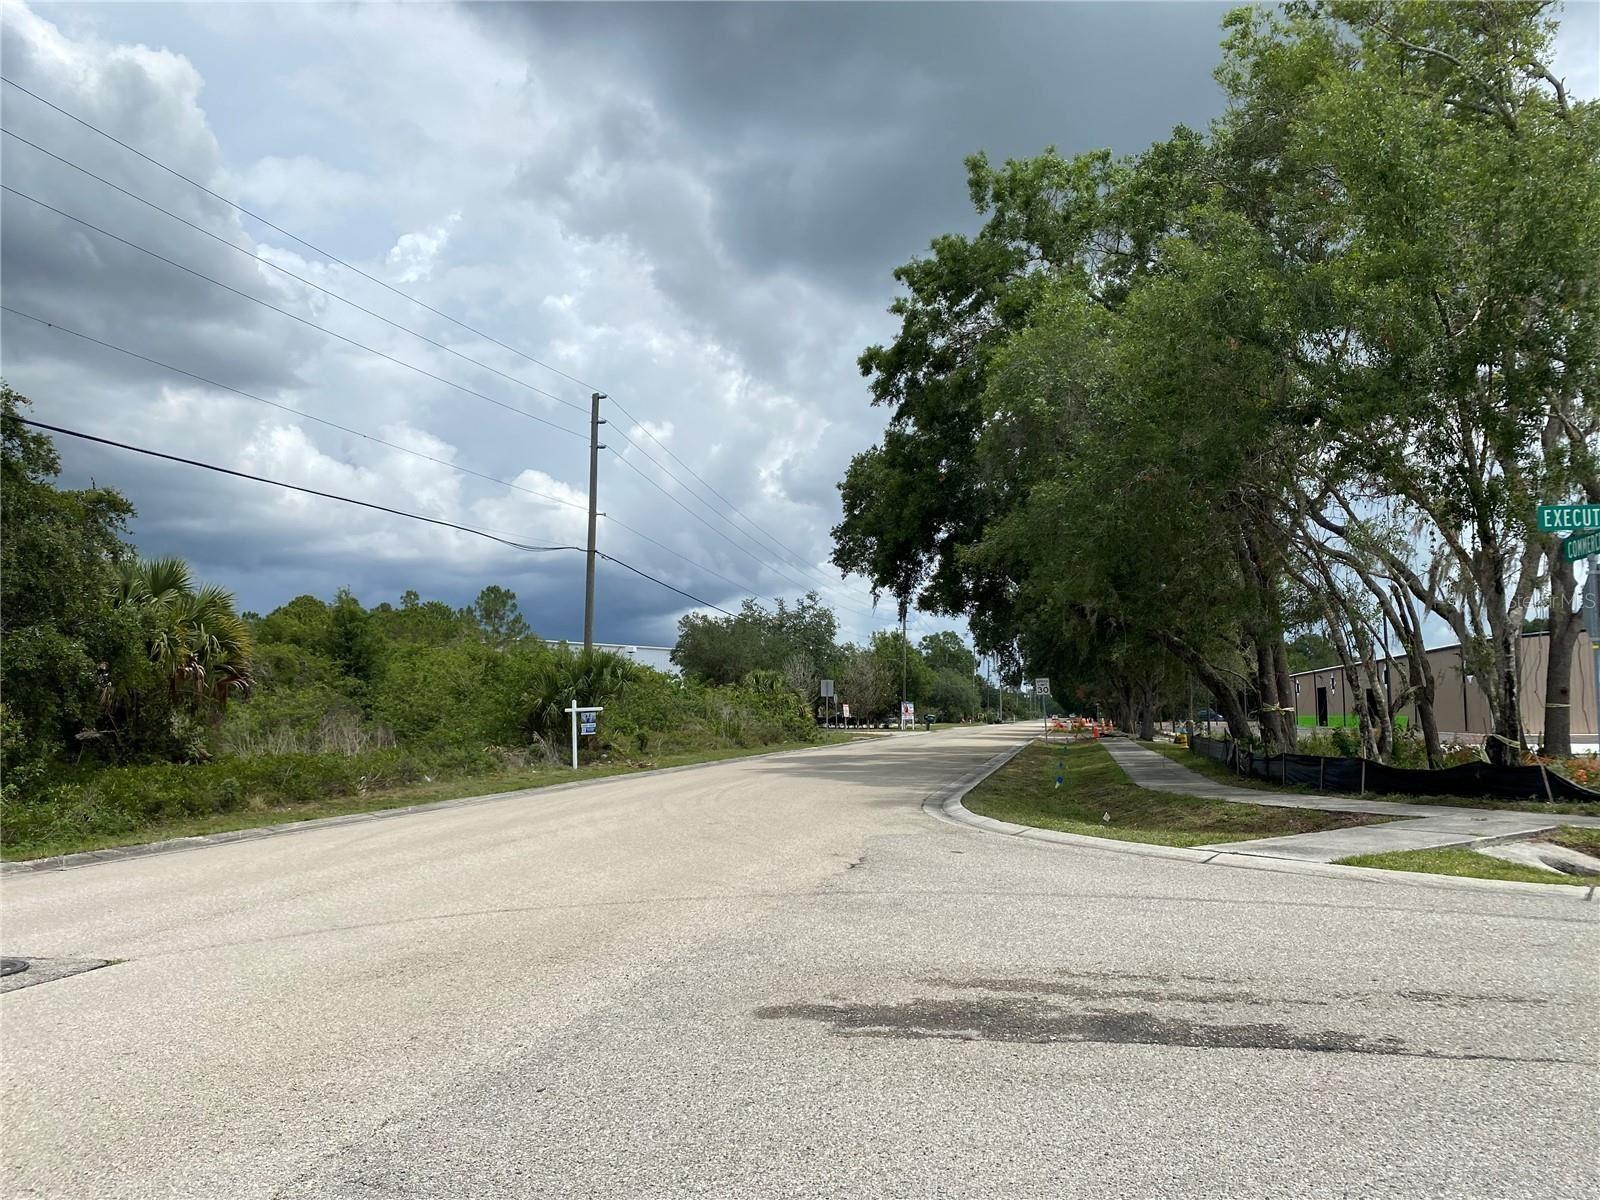 Photo of 2715 COMMERCE PARKWAY, NORTH PORT, FL 34289 (MLS # C7444117)